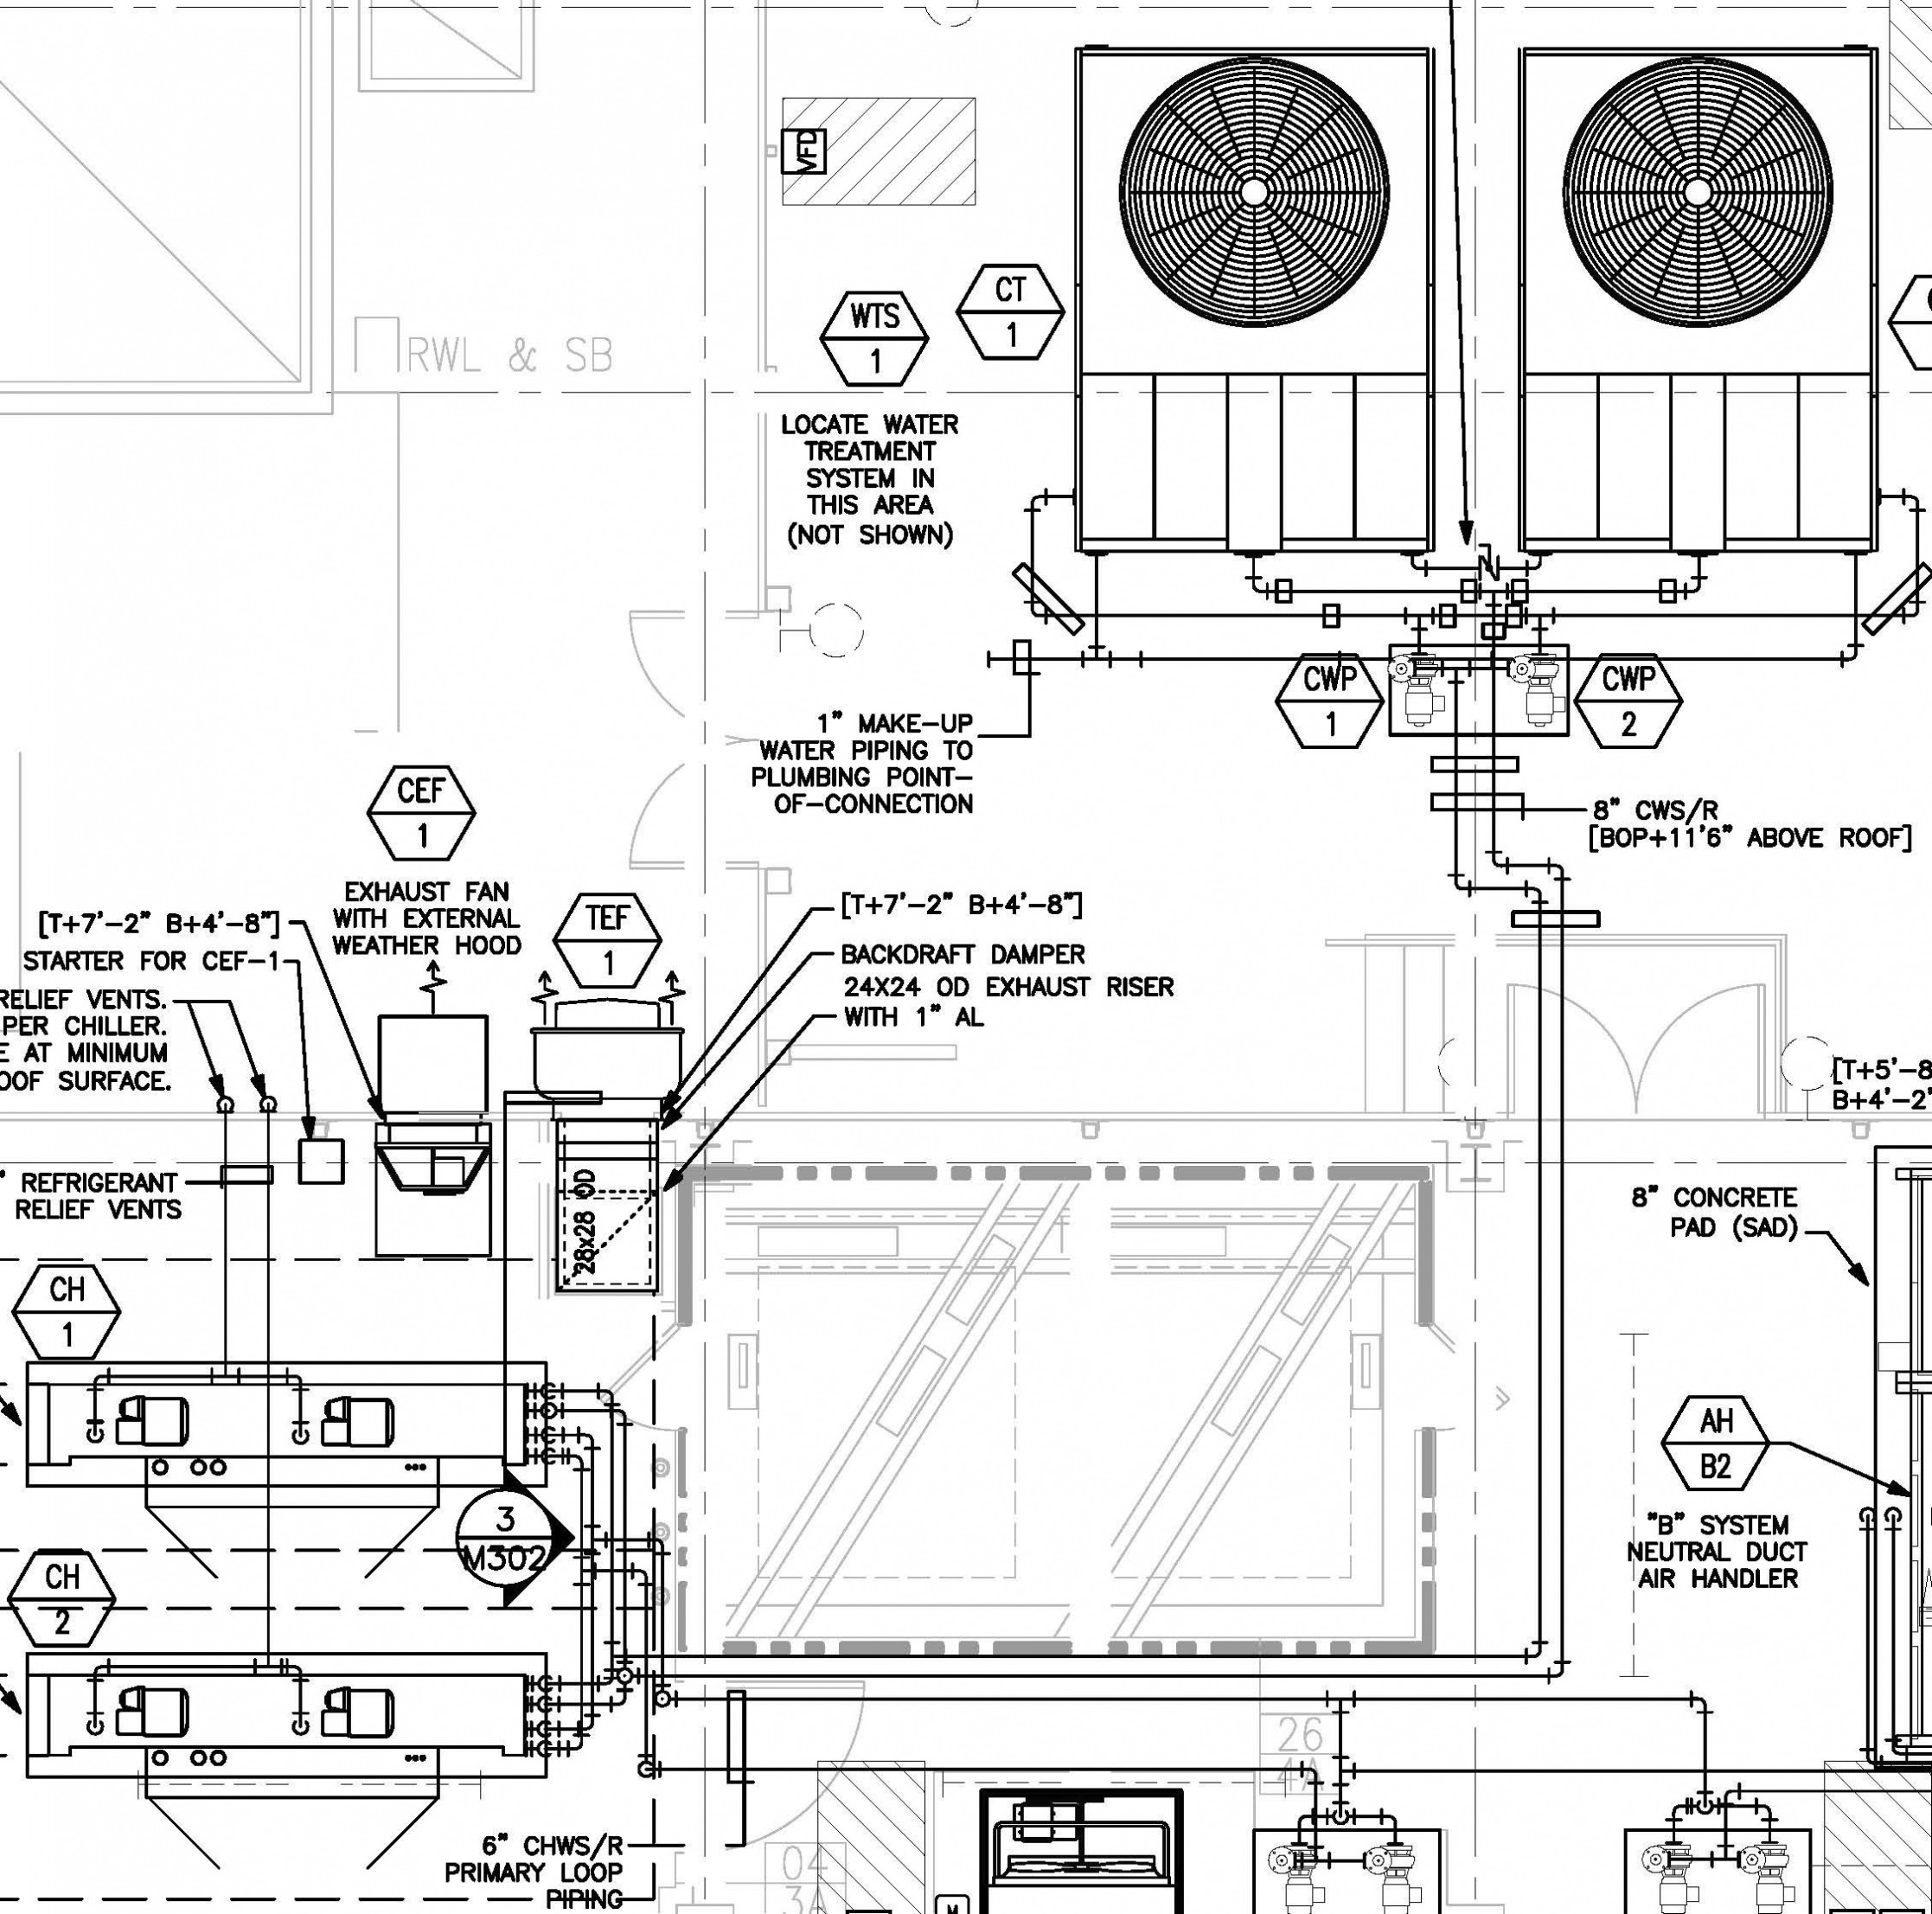 Vehicle Ac System Diagram Car Ac Air Duct Diagram Wiring Schematics Diagram Of Vehicle Ac System Diagram